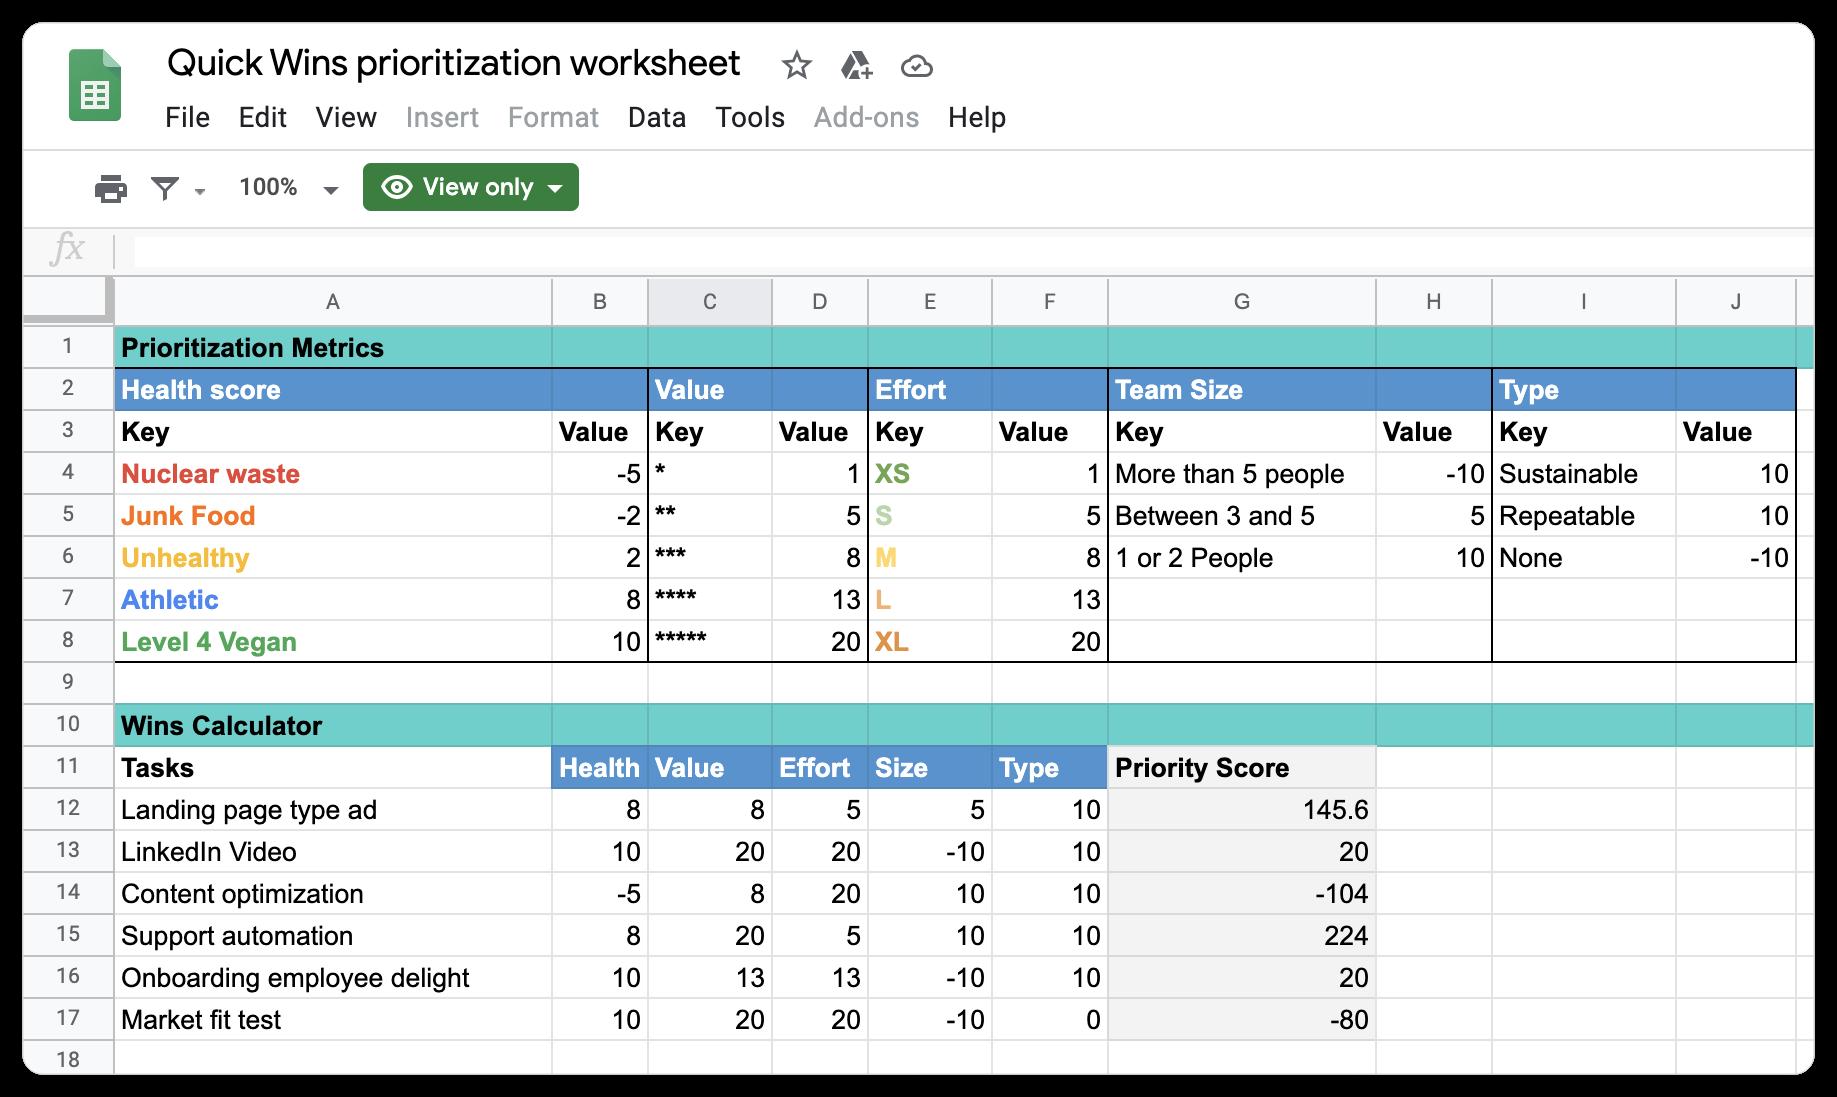 Quick Wins Prioritization Template Spreadsheet - 5 Metrics to Calculate